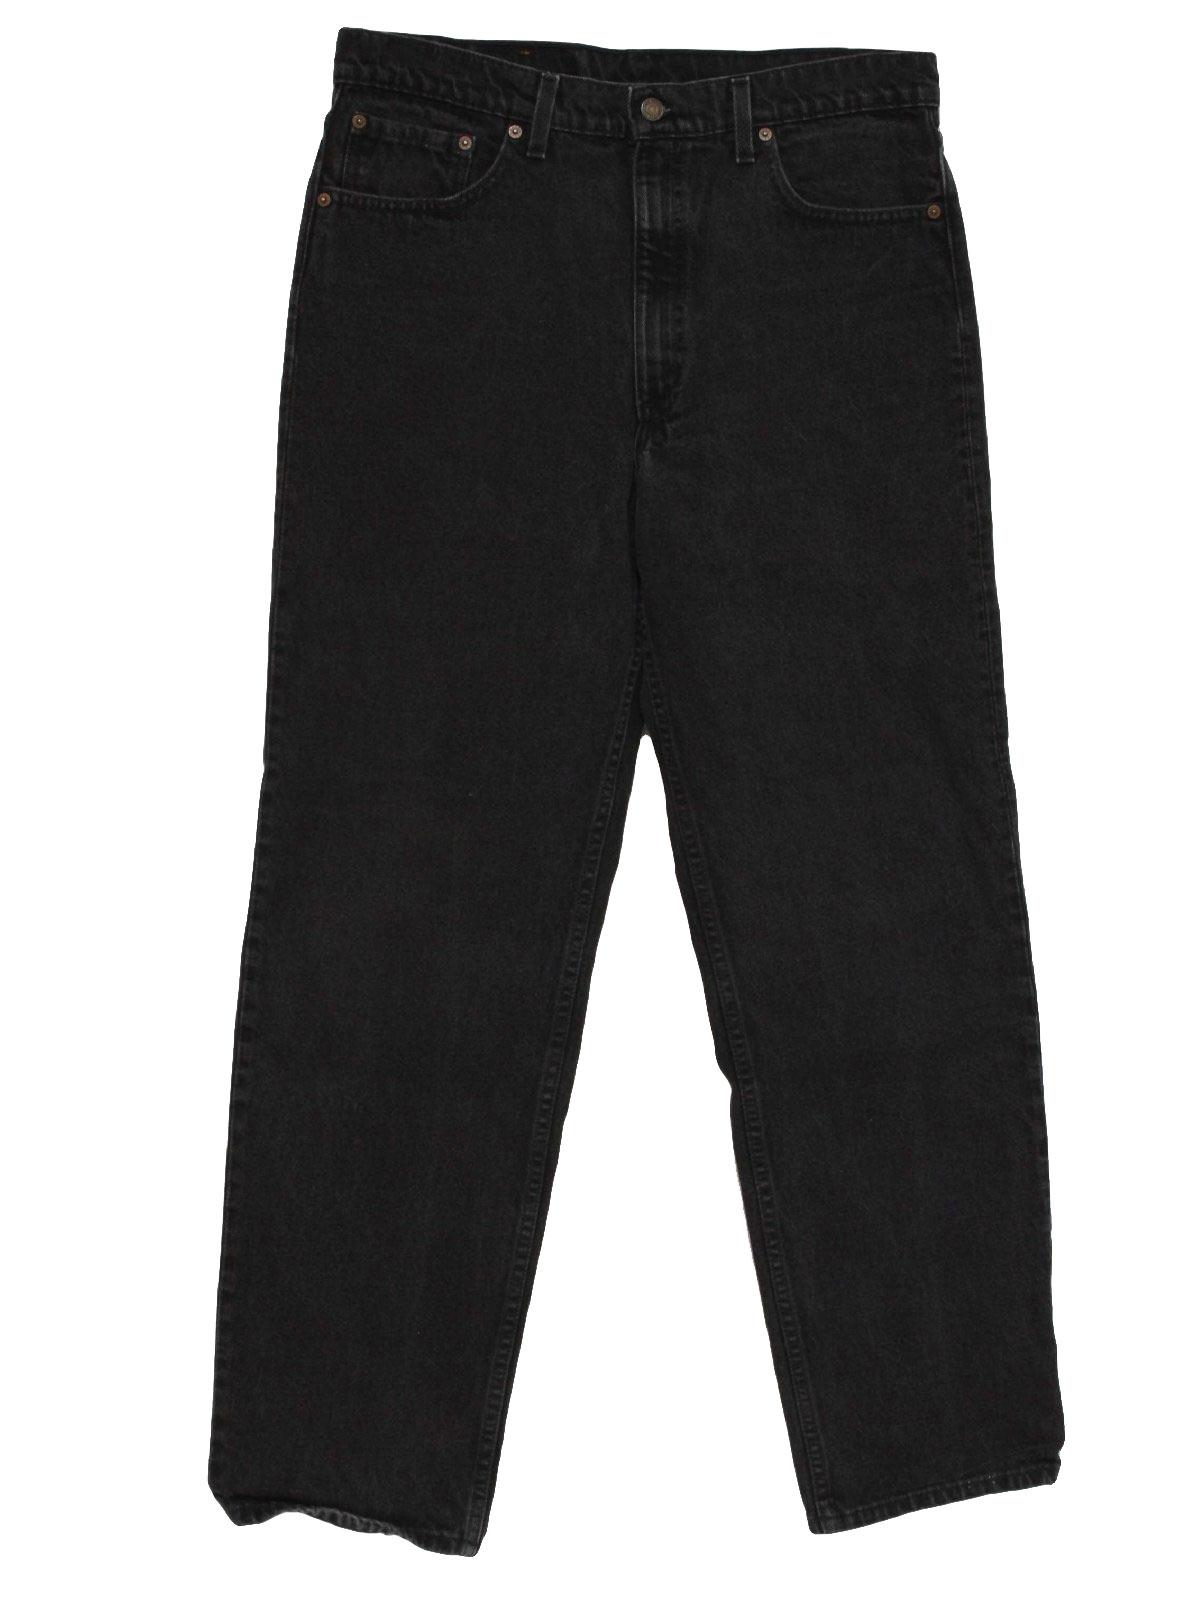 black pants jeans - Pi Pants